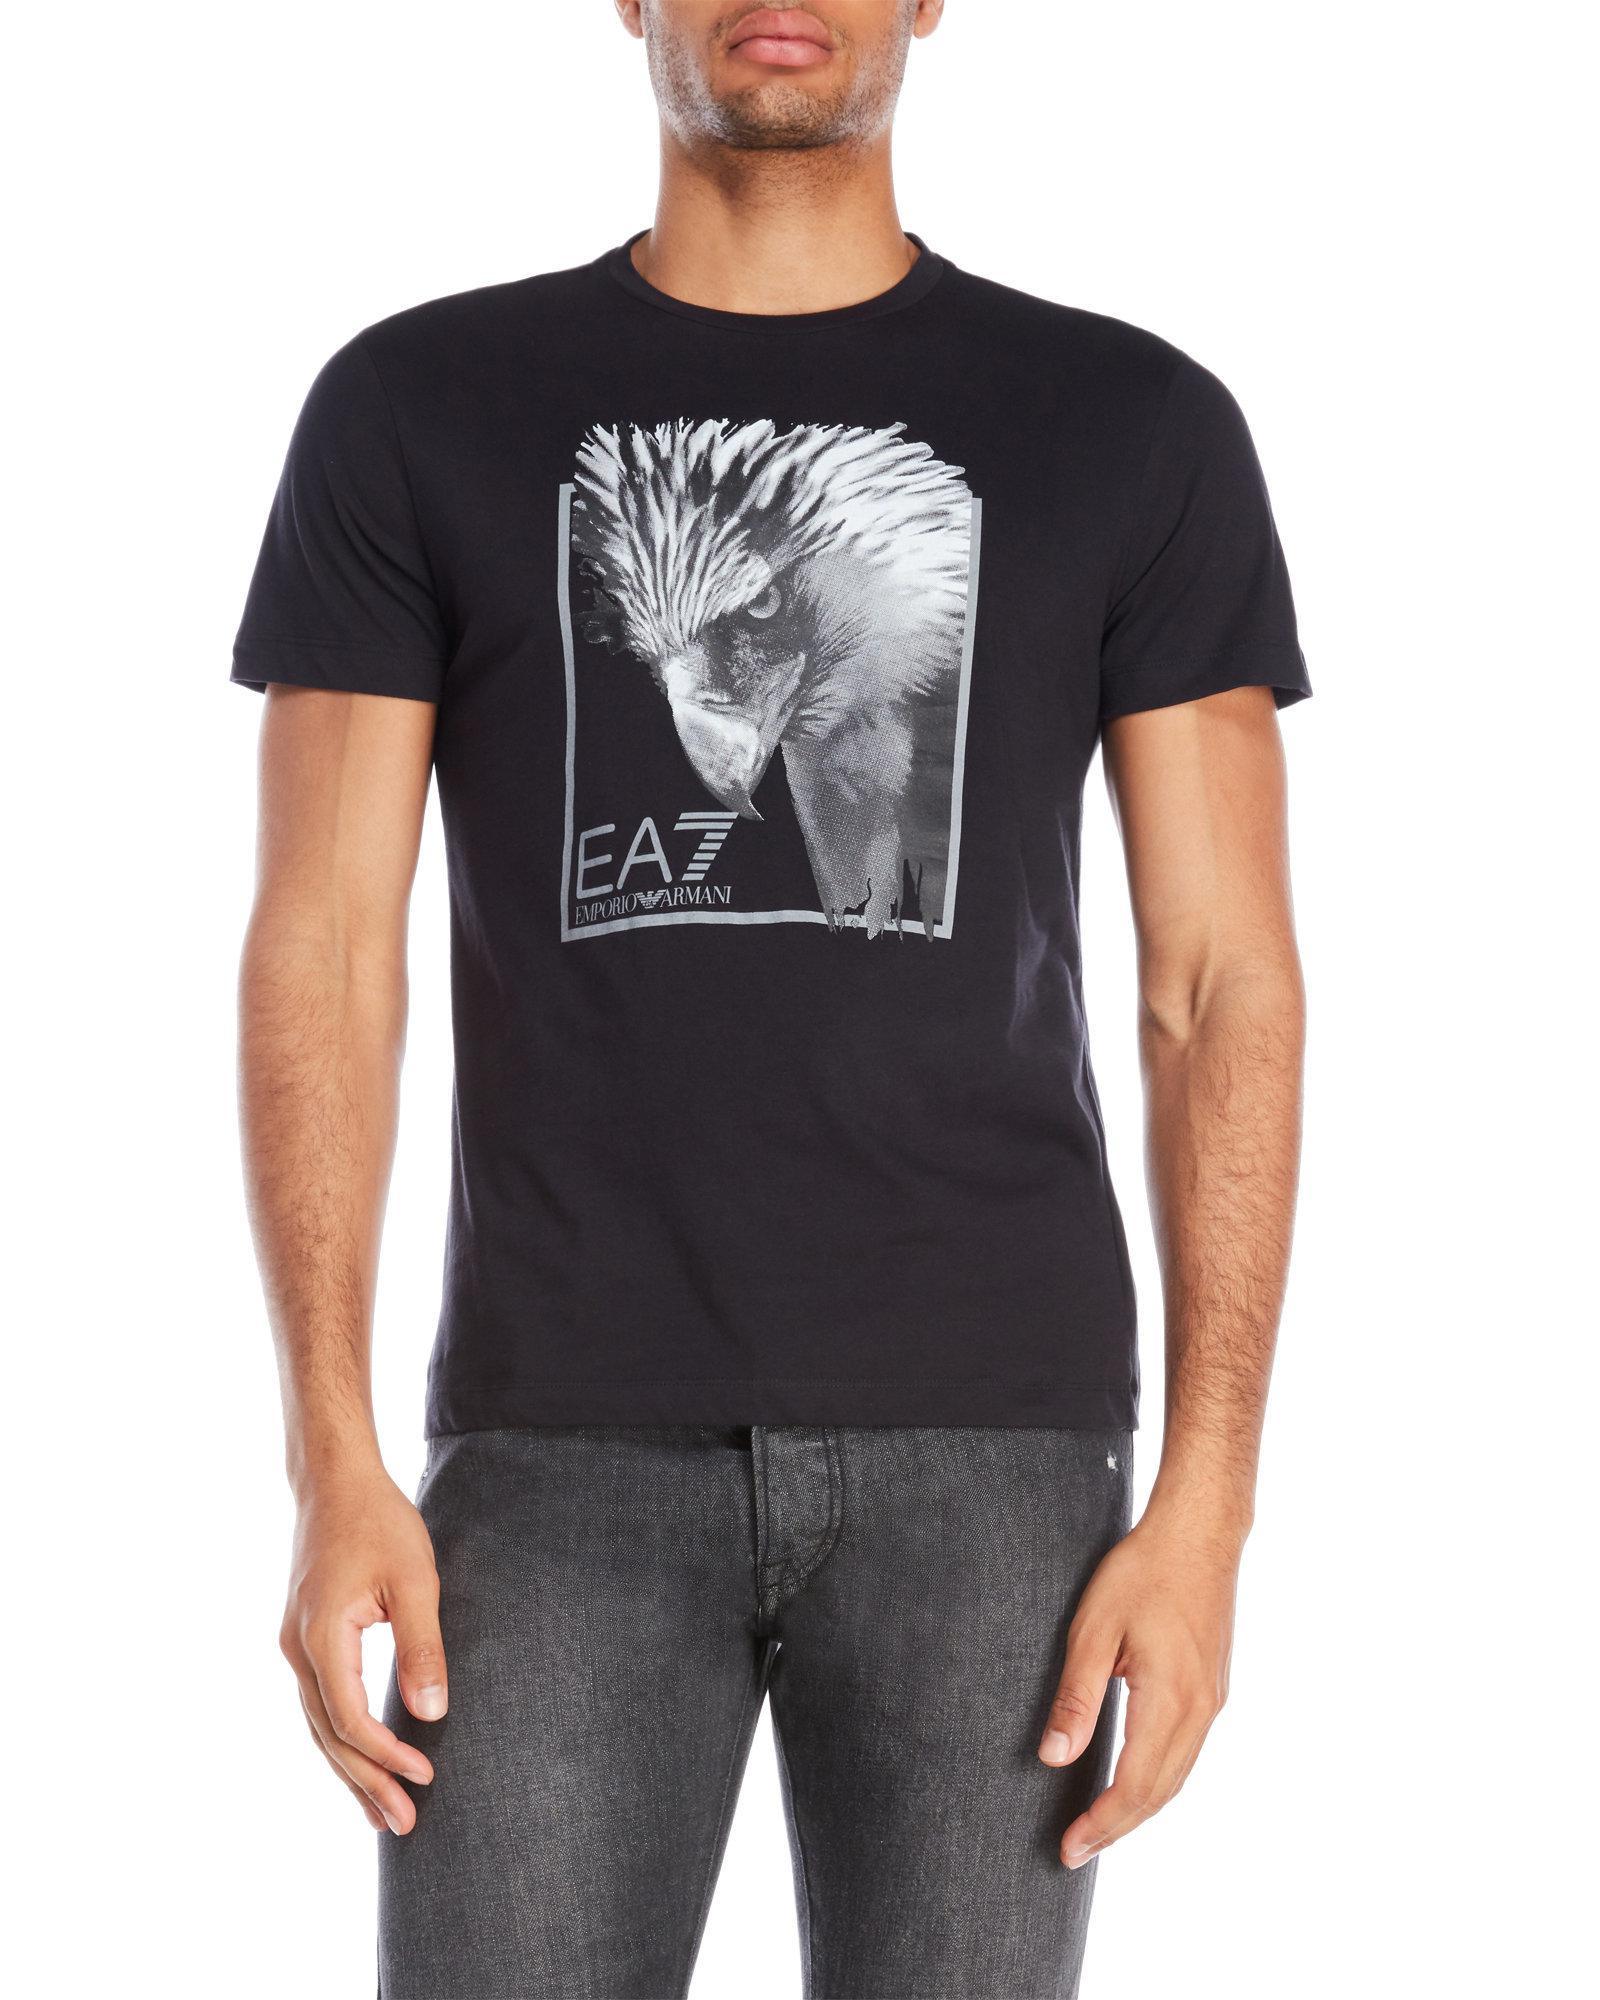 Lyst emporio armani eagle logo tee in black for men - Emporio giorgio armani logo ...